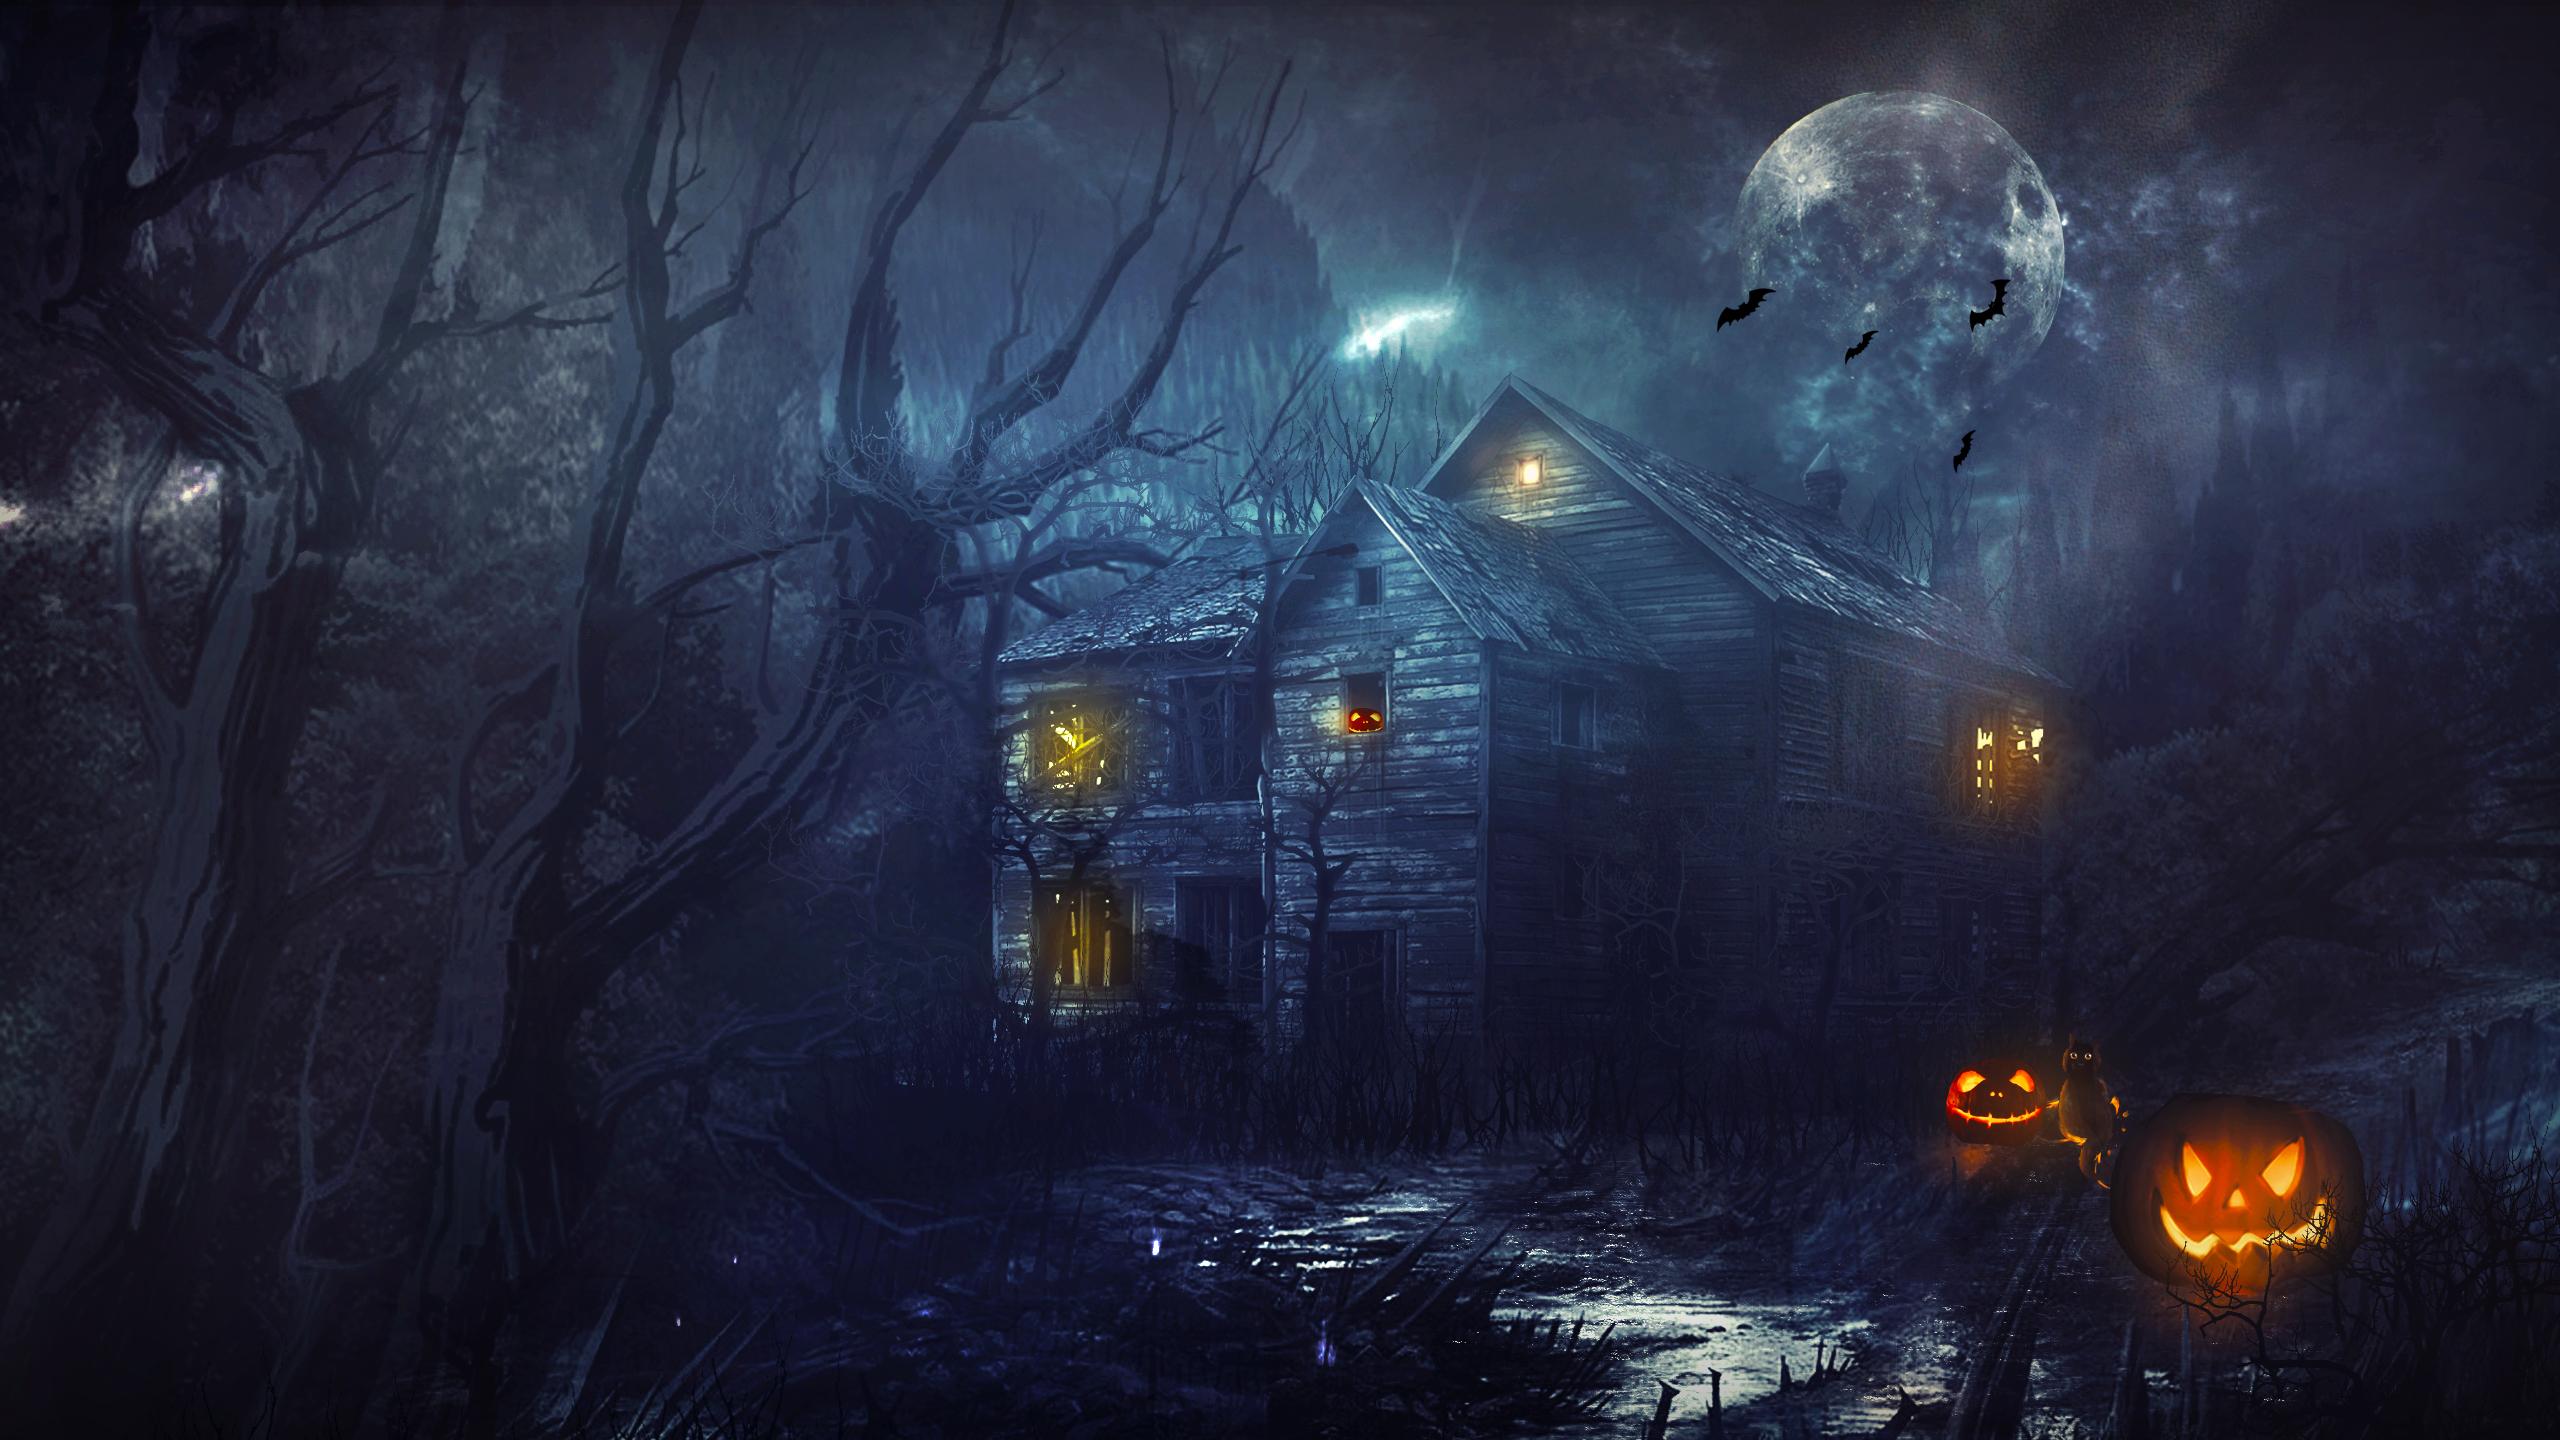 halloween moon wallpaper - photo #7